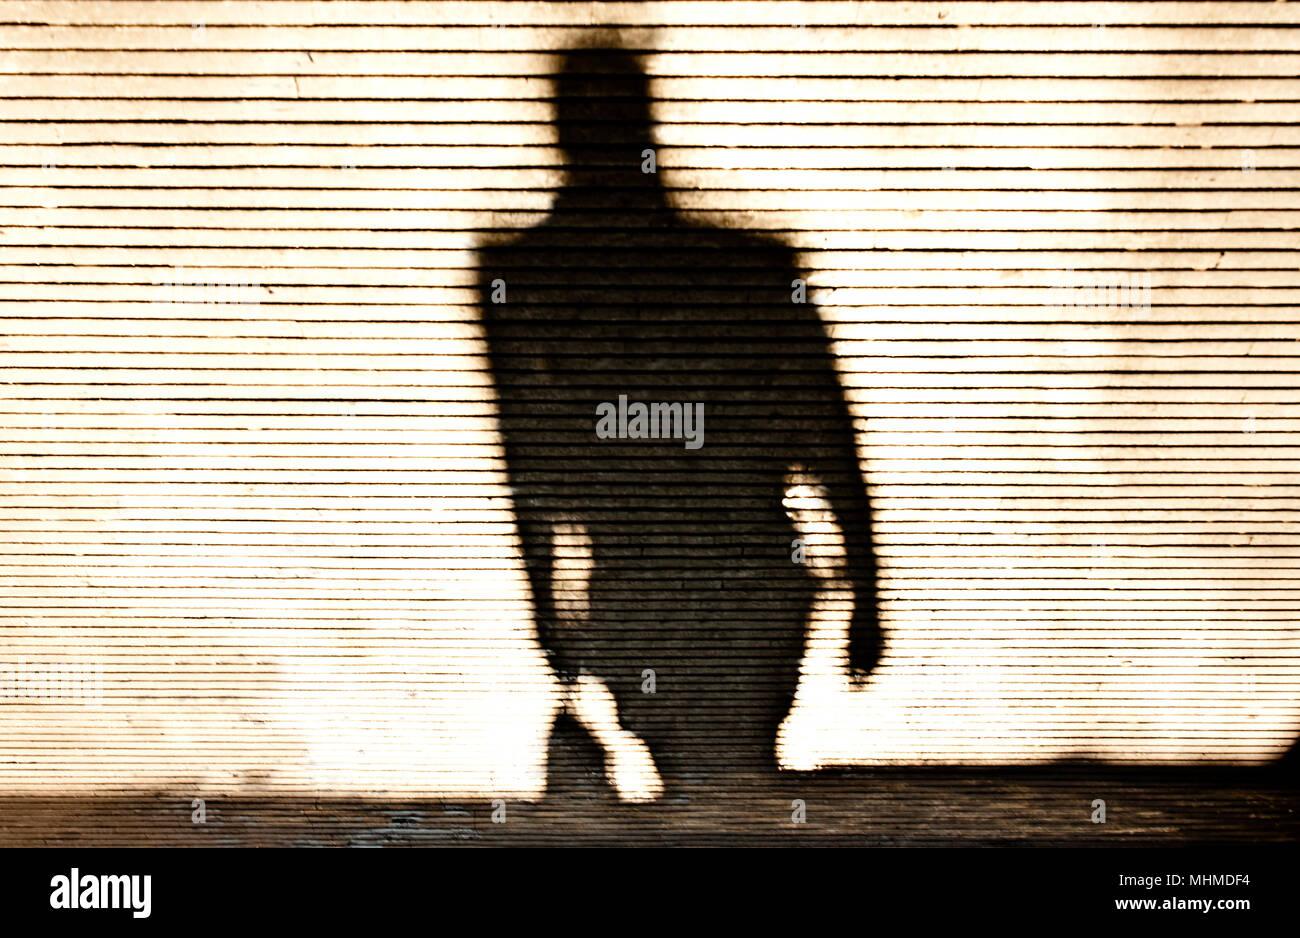 Blurry shadow silhouette of a man walking on patterned sidewalk - Stock Image